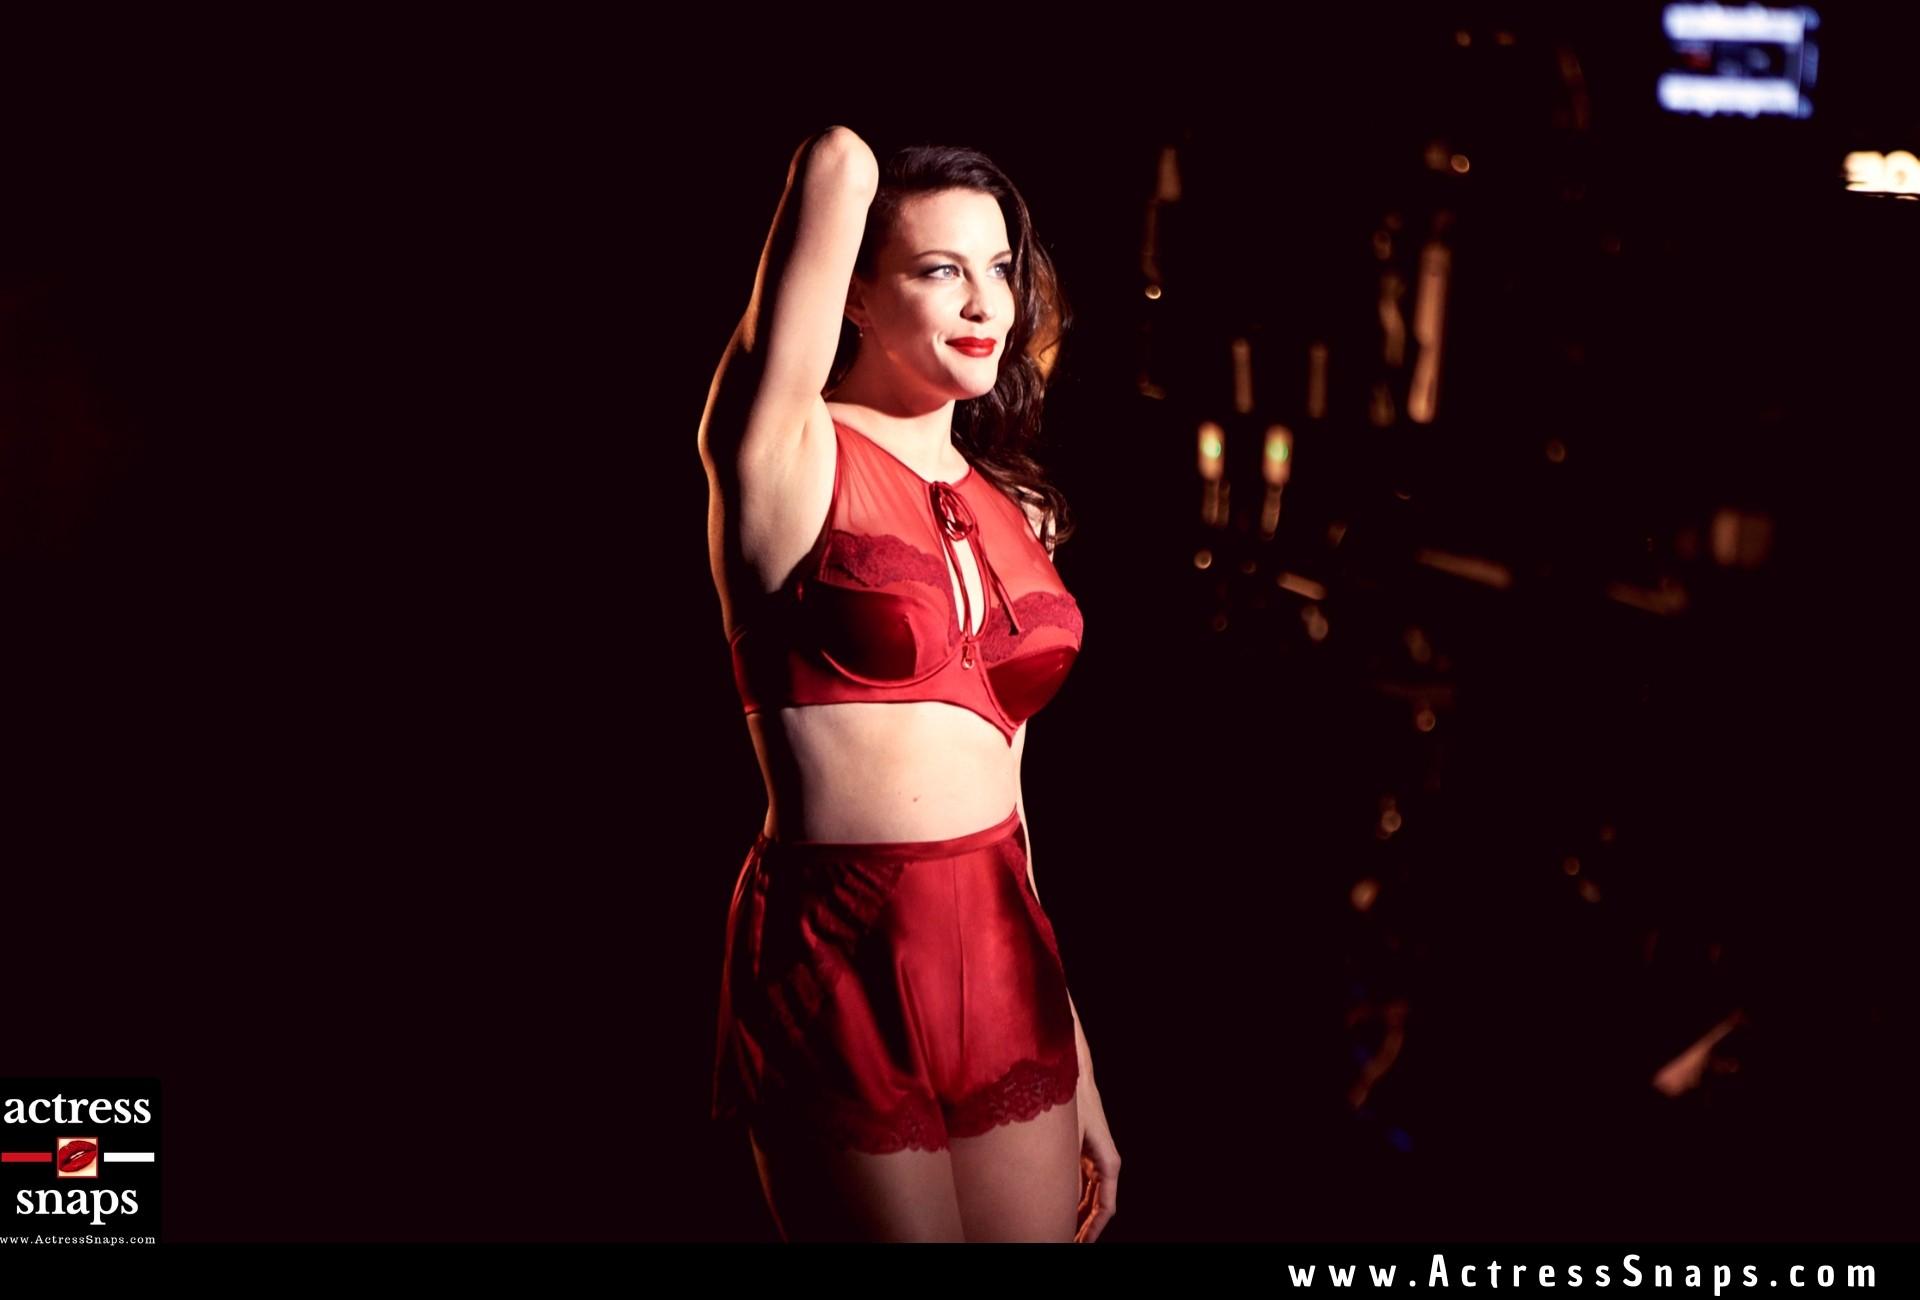 Liv Tyler- Triump Lingerie Photos - Sexy Actress Pictures   Hot Actress Pictures - ActressSnaps.com